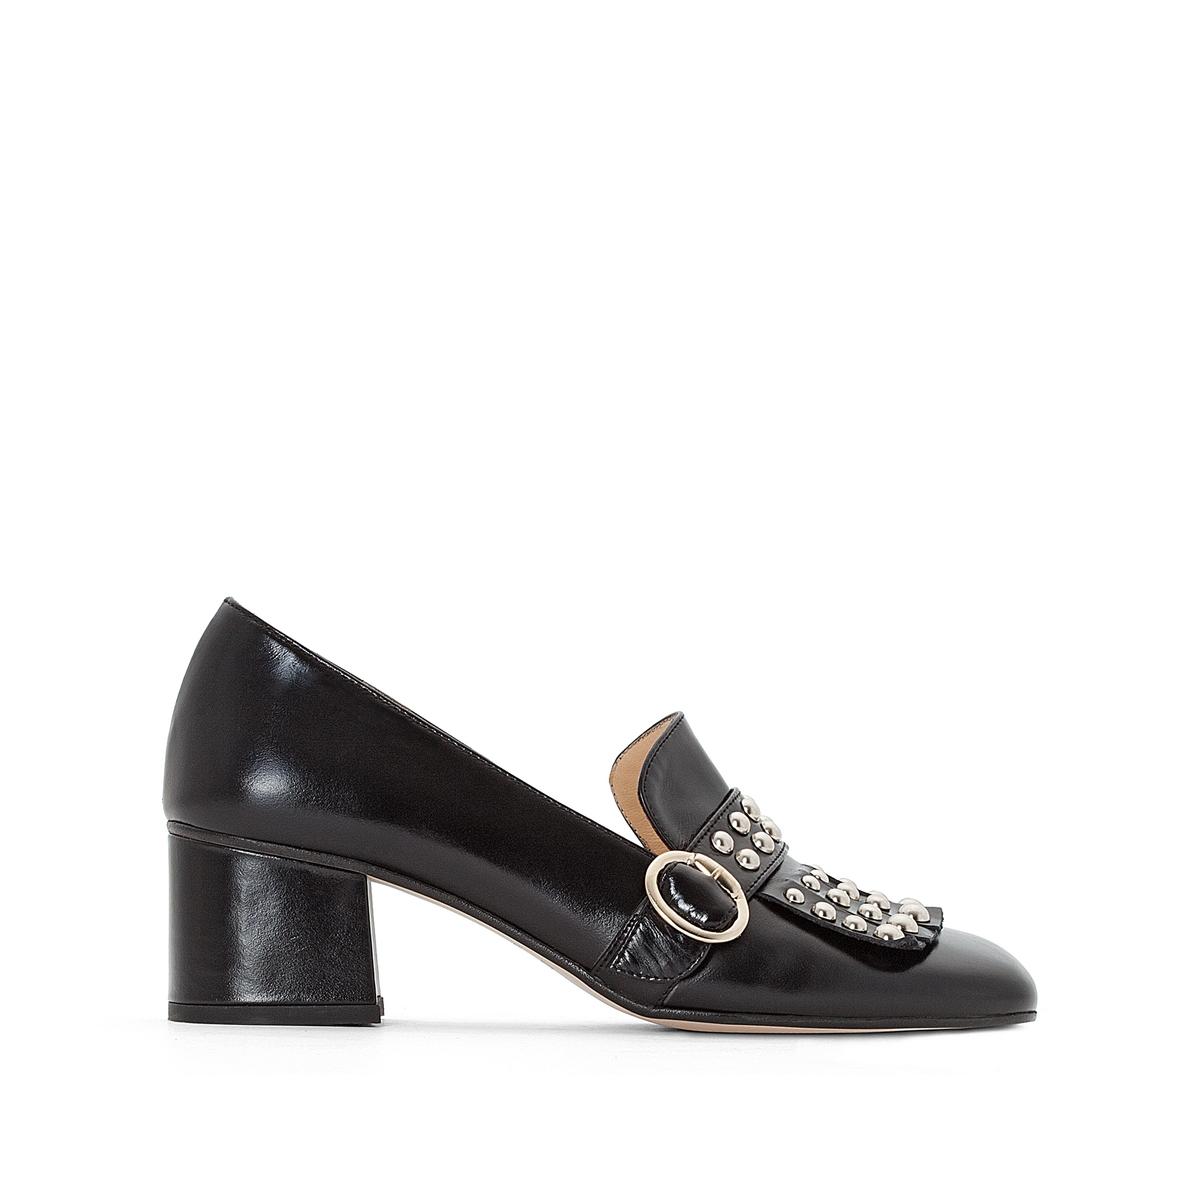 Туфли кожаные на широком каблуке, Victoire цены онлайн